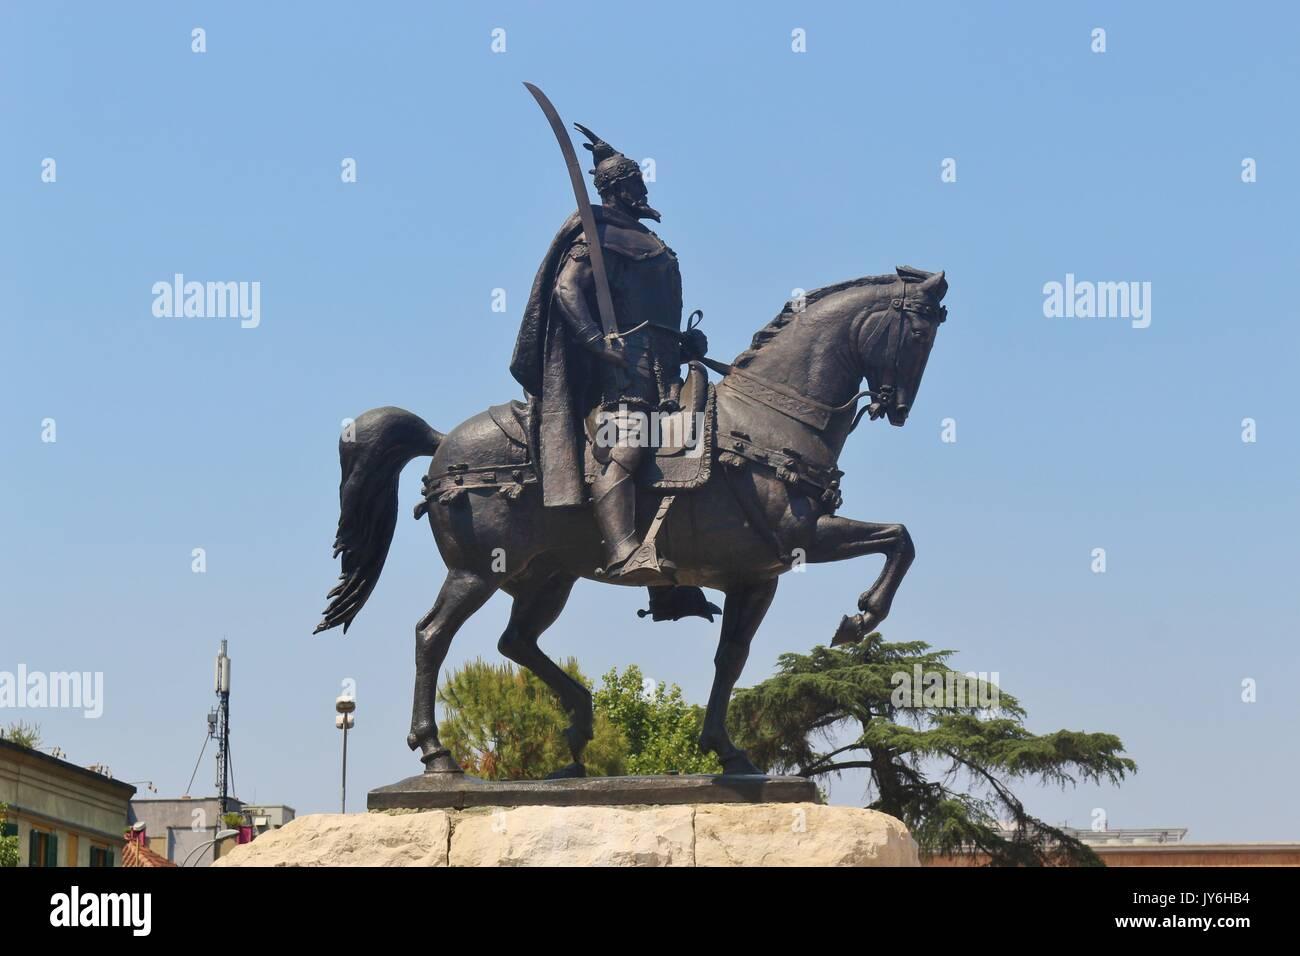 Tirana, Albania: Statue of Skanderbeg or Gjergj Kastrioti who fought against the empire in the 15th century. On the Skanderbeg square. - Stock Image